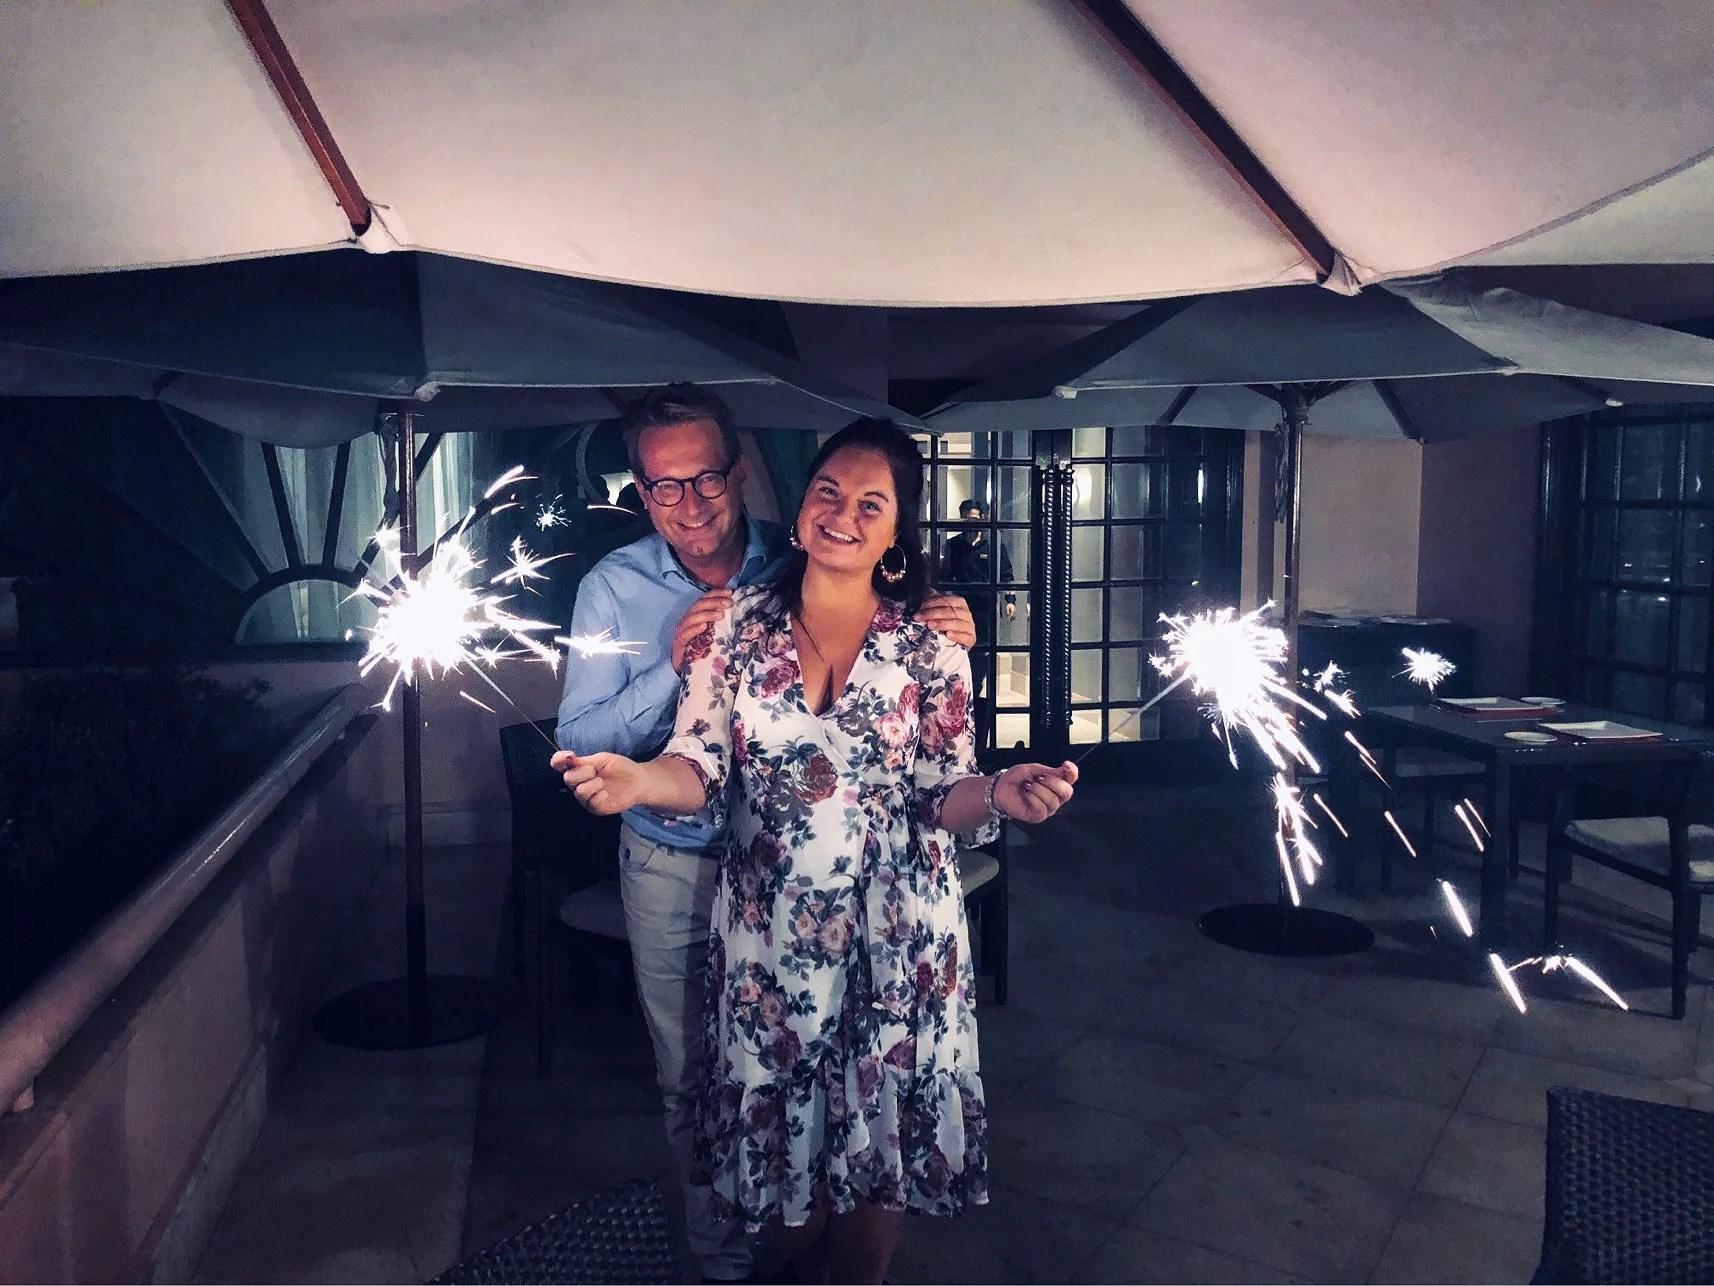 Happy Diwali - Festival of lights!